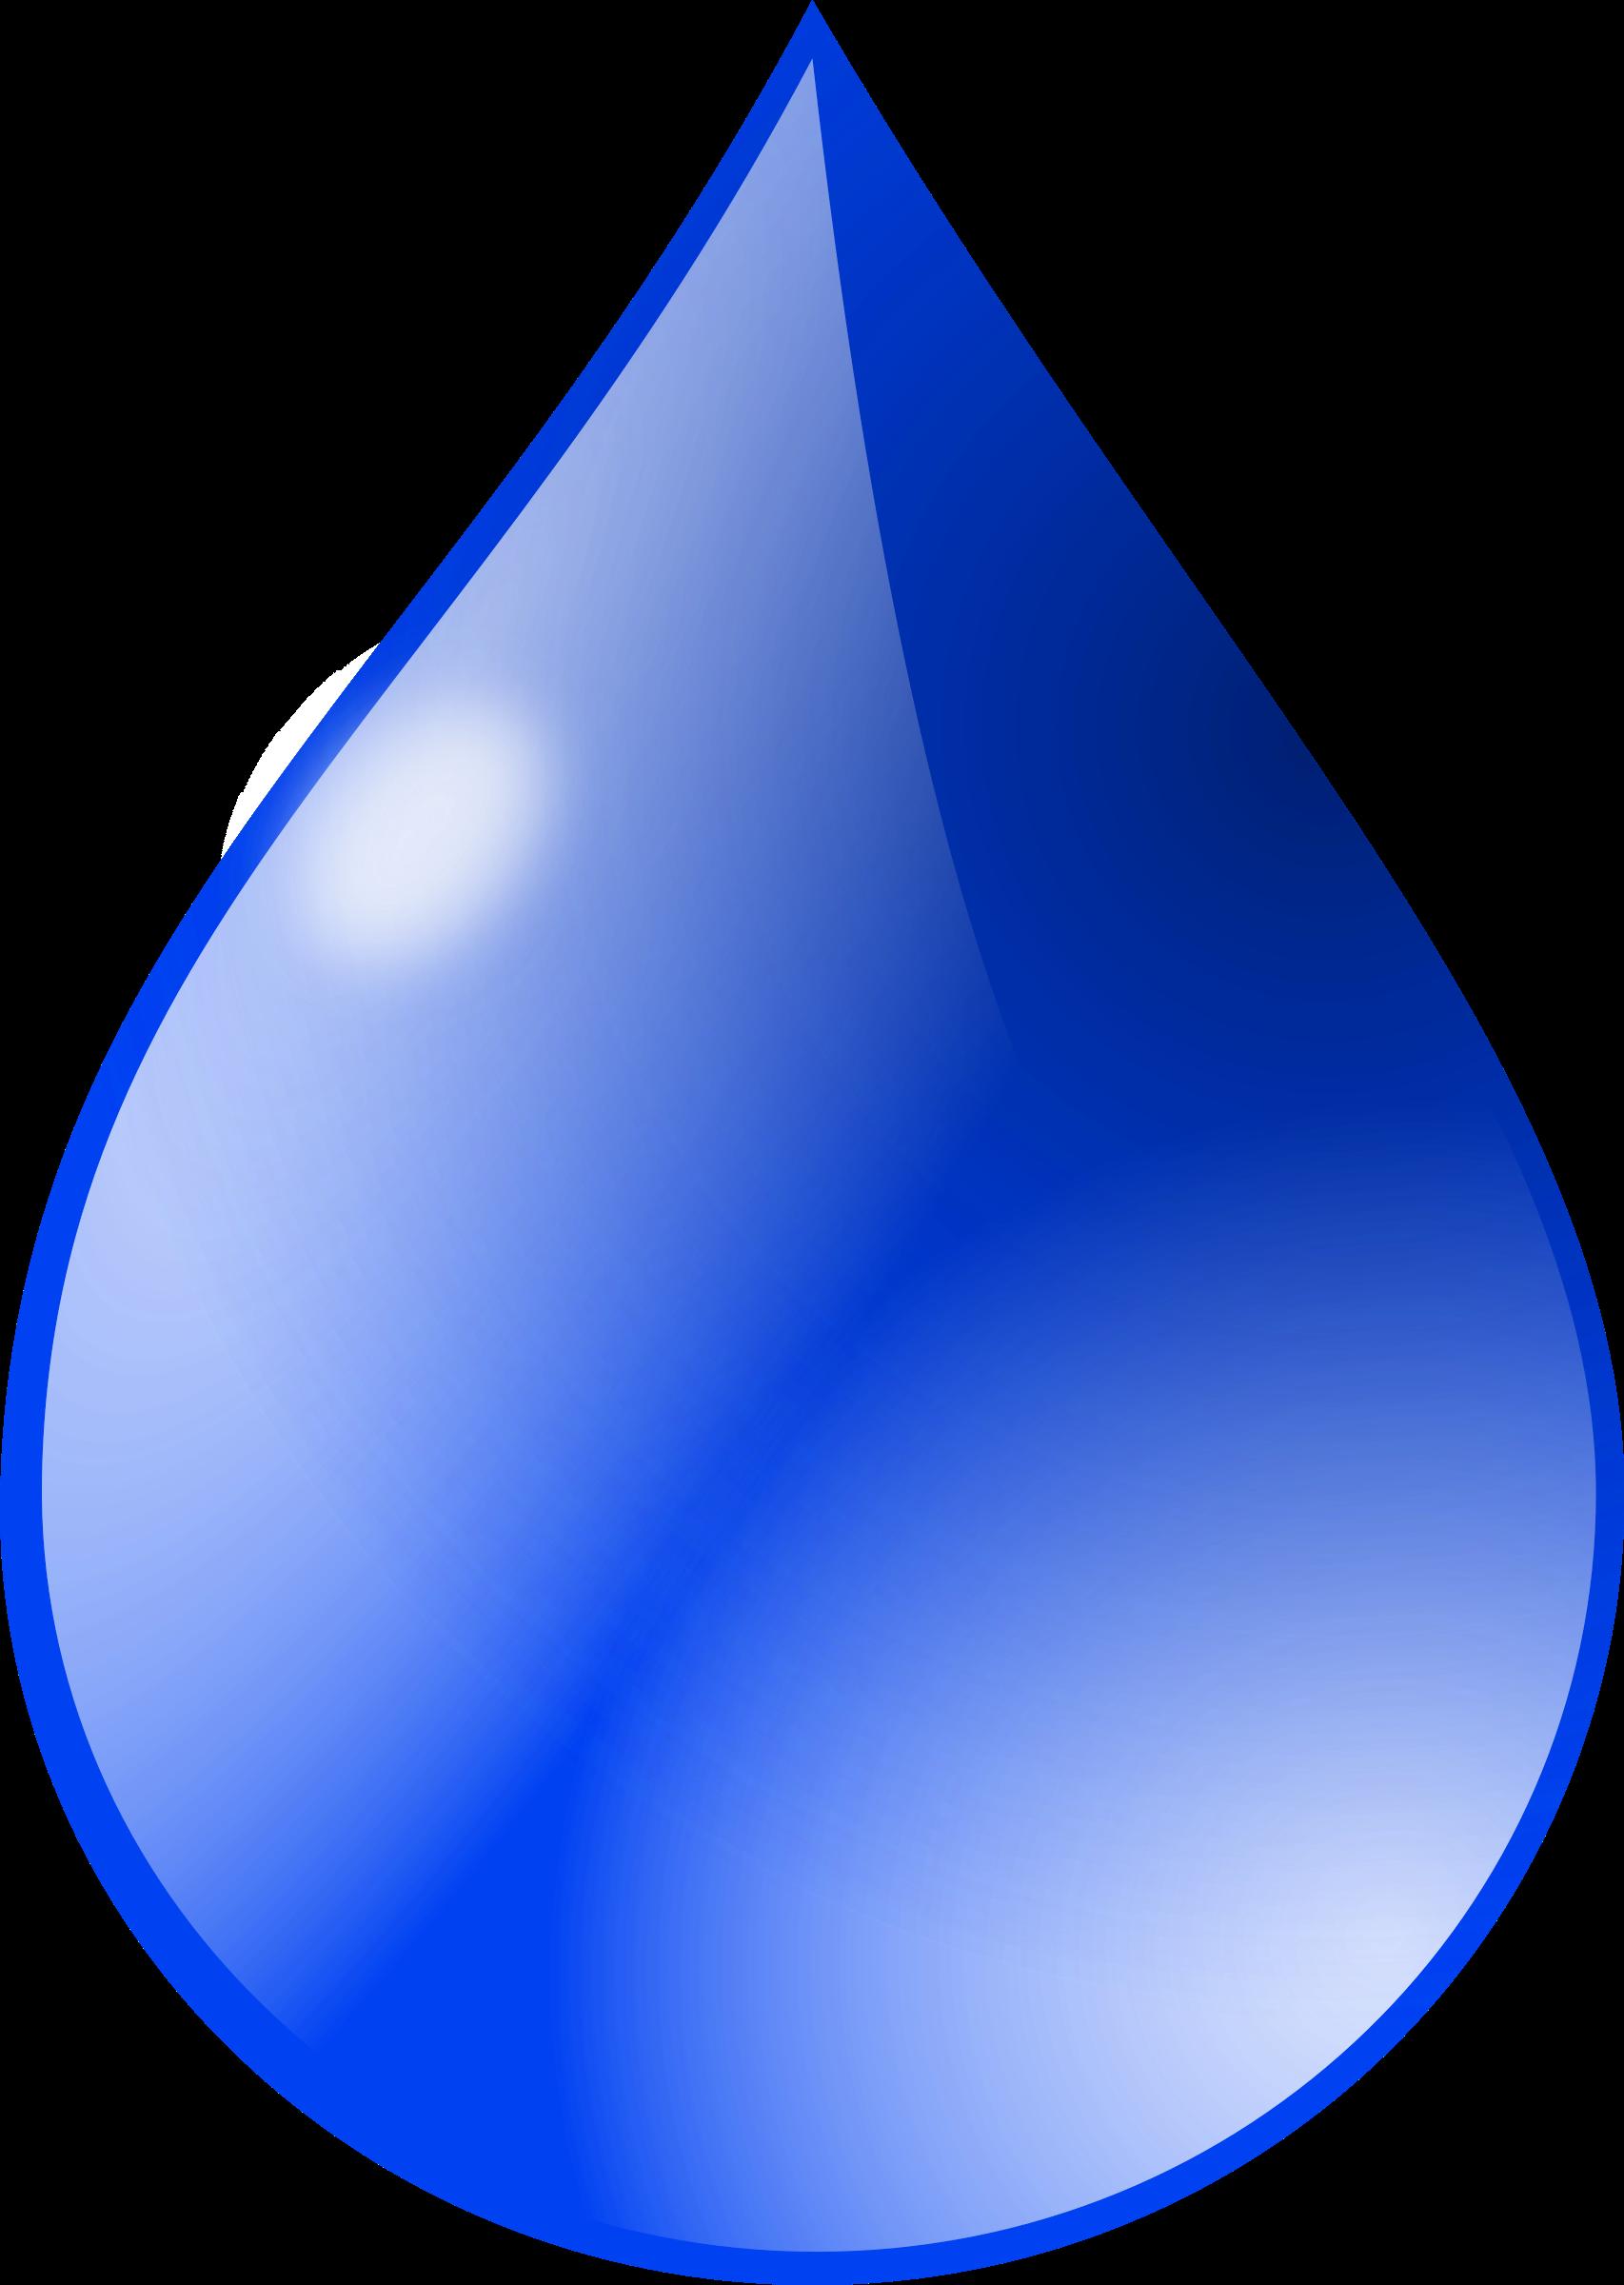 Faucet clipart water drawing. Drop big image png